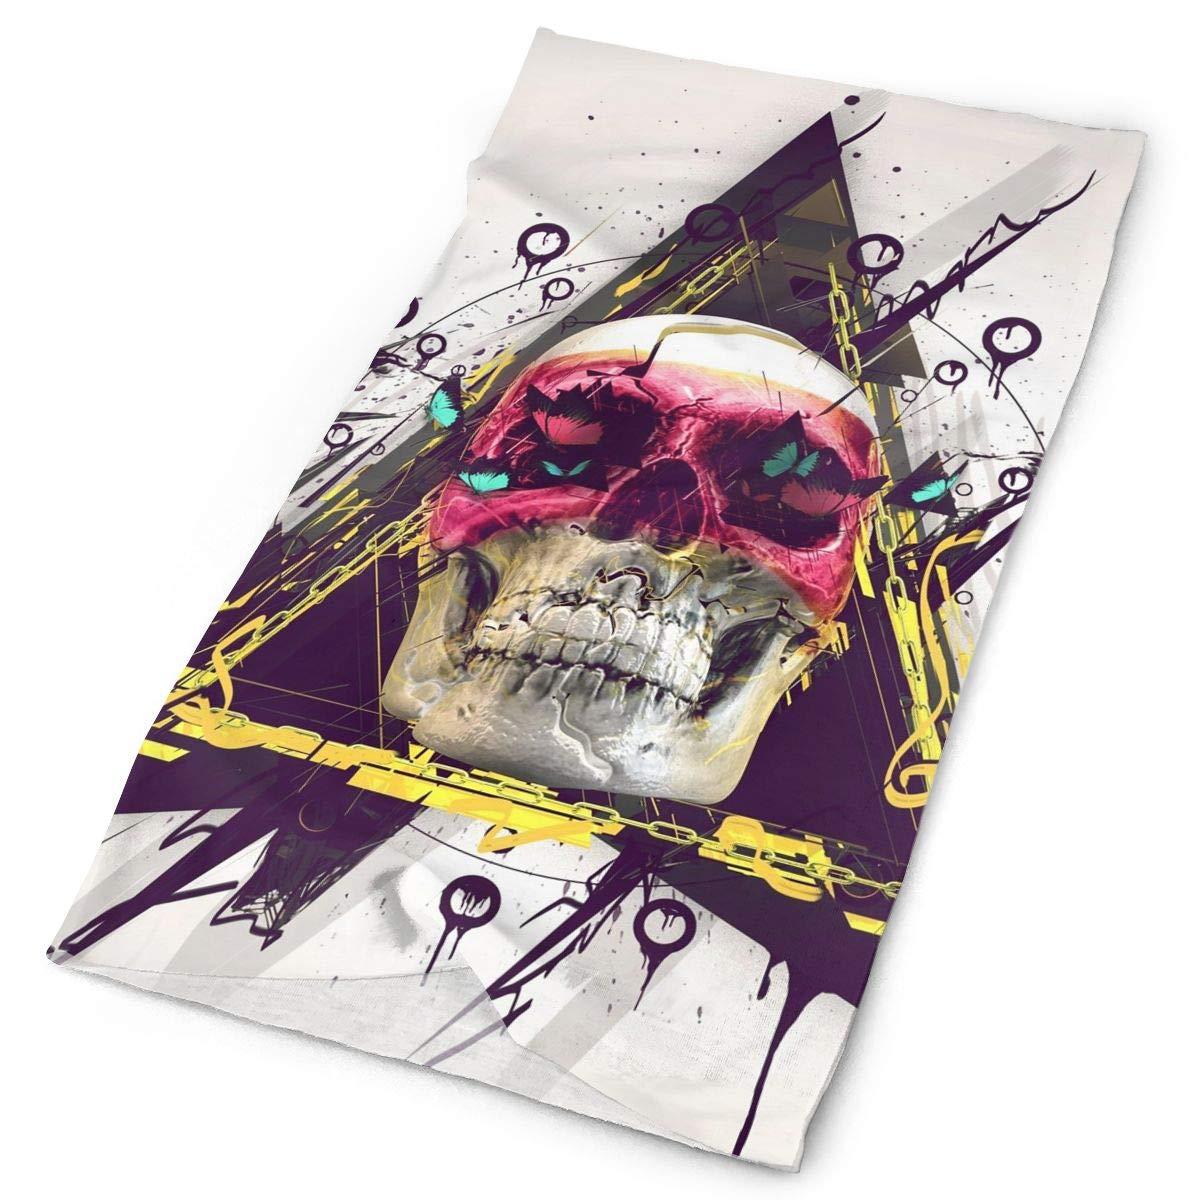 Headbands Skull Gallery Headwear Bandana Sweatband Gaiter Head Wrap Mask Neck Outdoor Scarf